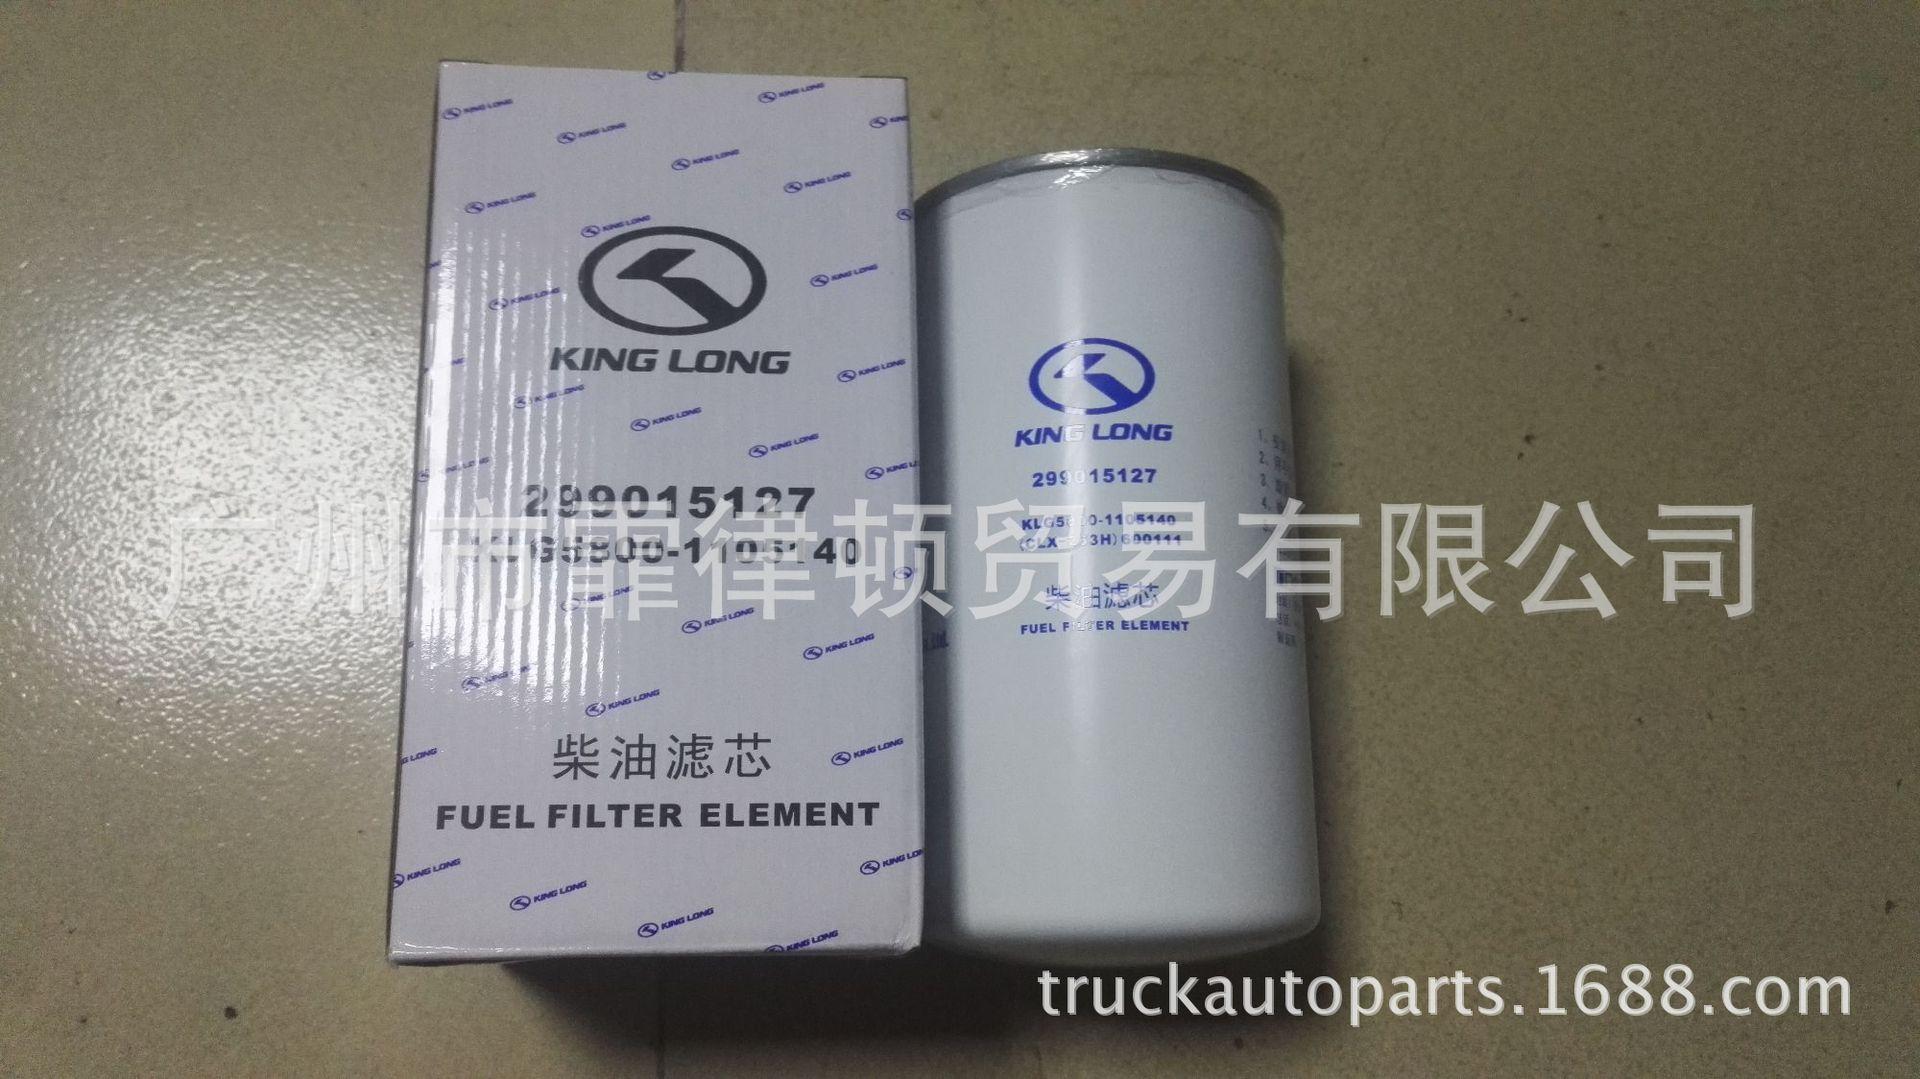 KINGLONG Bus 柴油滤清器 299015127  金龙客车配件